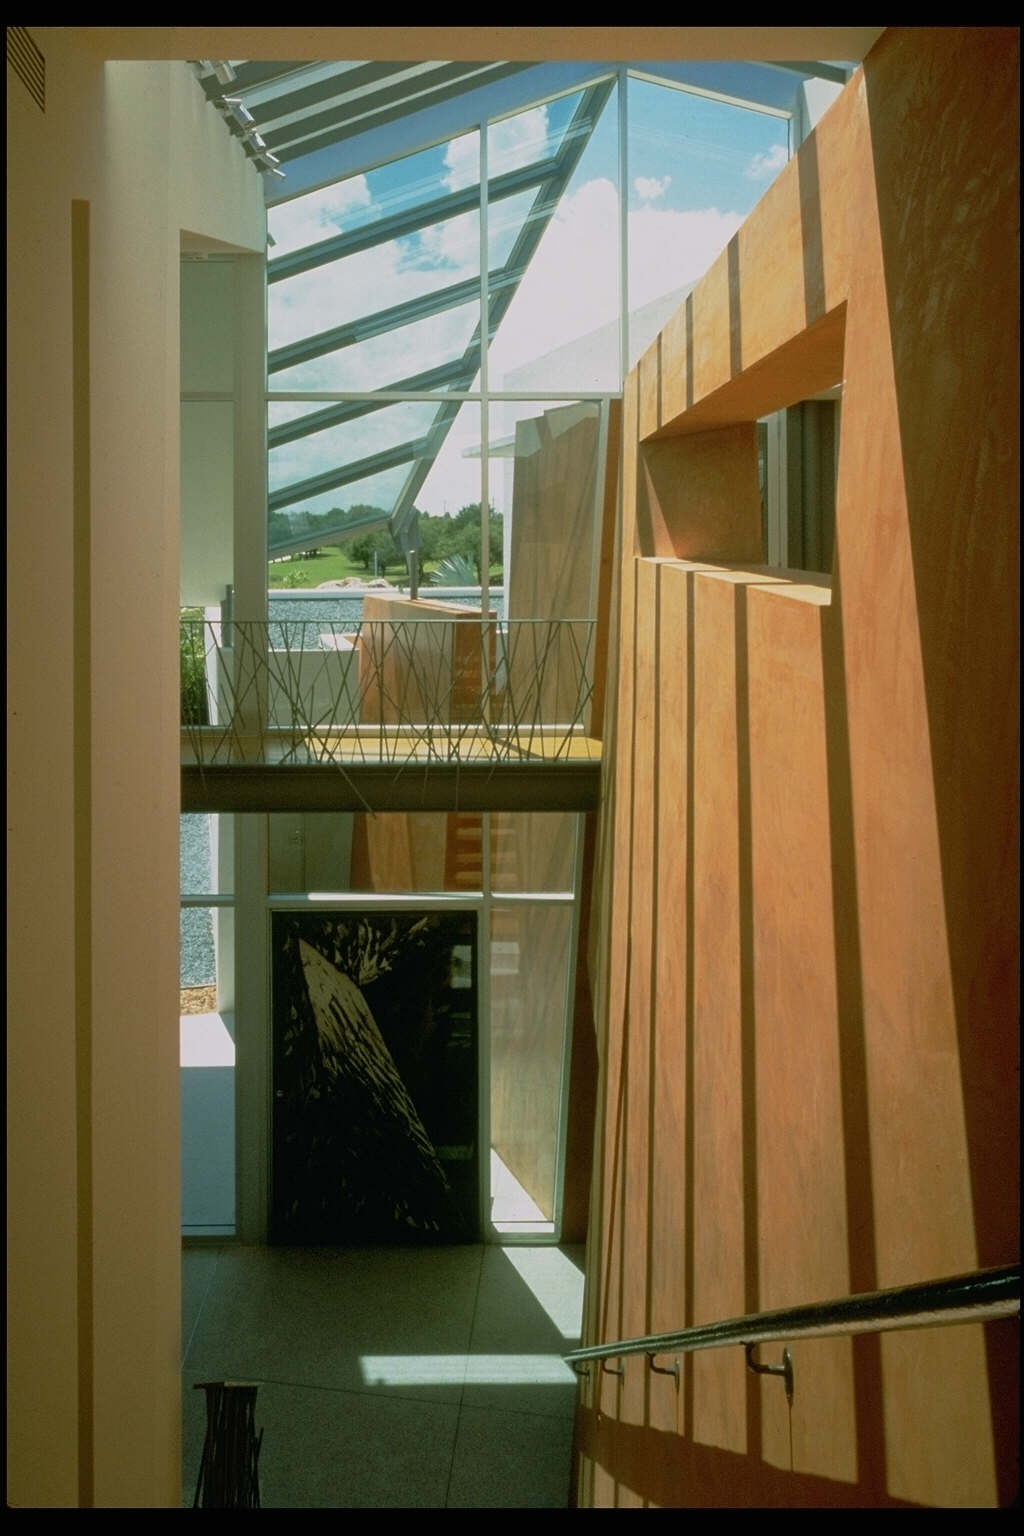 Israel, Callas, Shortridge Associates, 254 N. Robertson Blvd, #205, Los Angeles, CA 90211